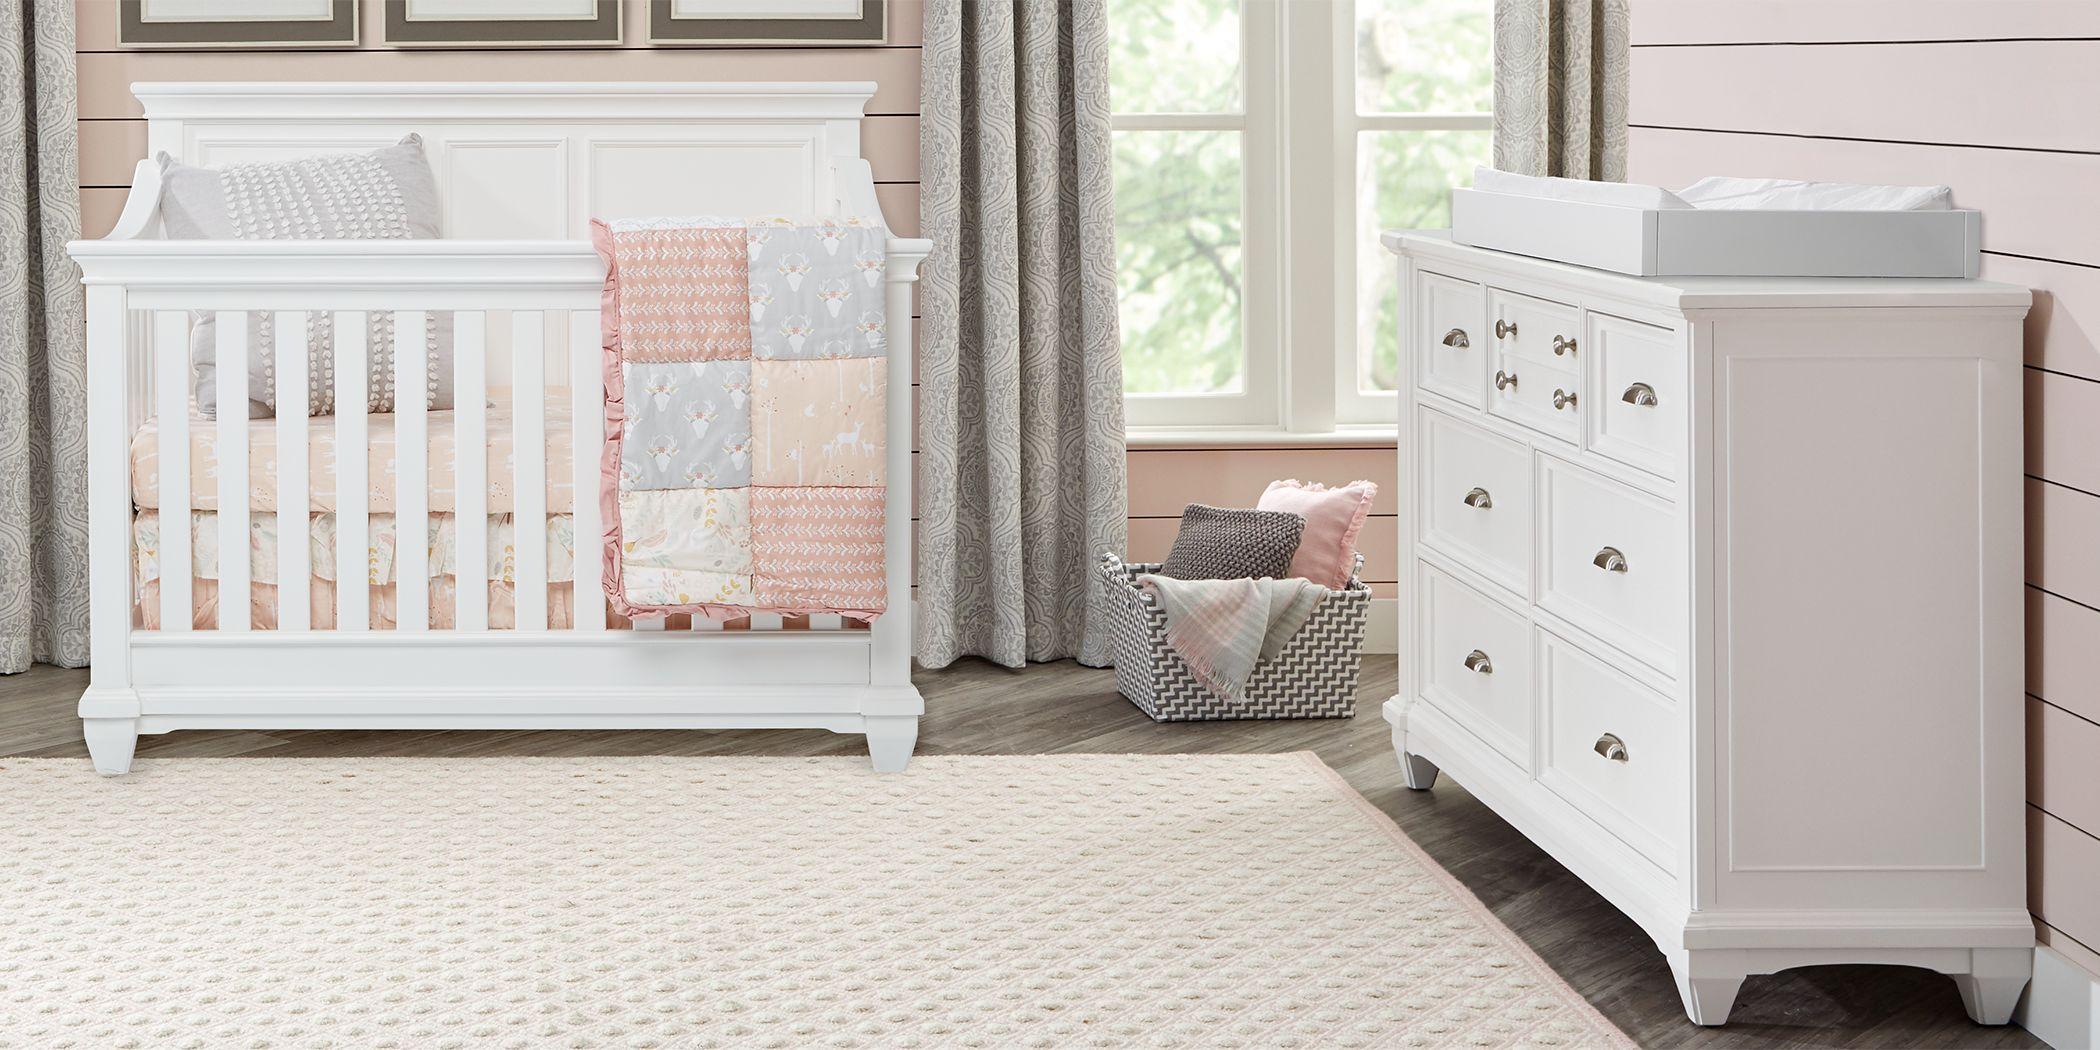 Hilton Head White 6 Pc Nursery with Toddler & Conversion Rails